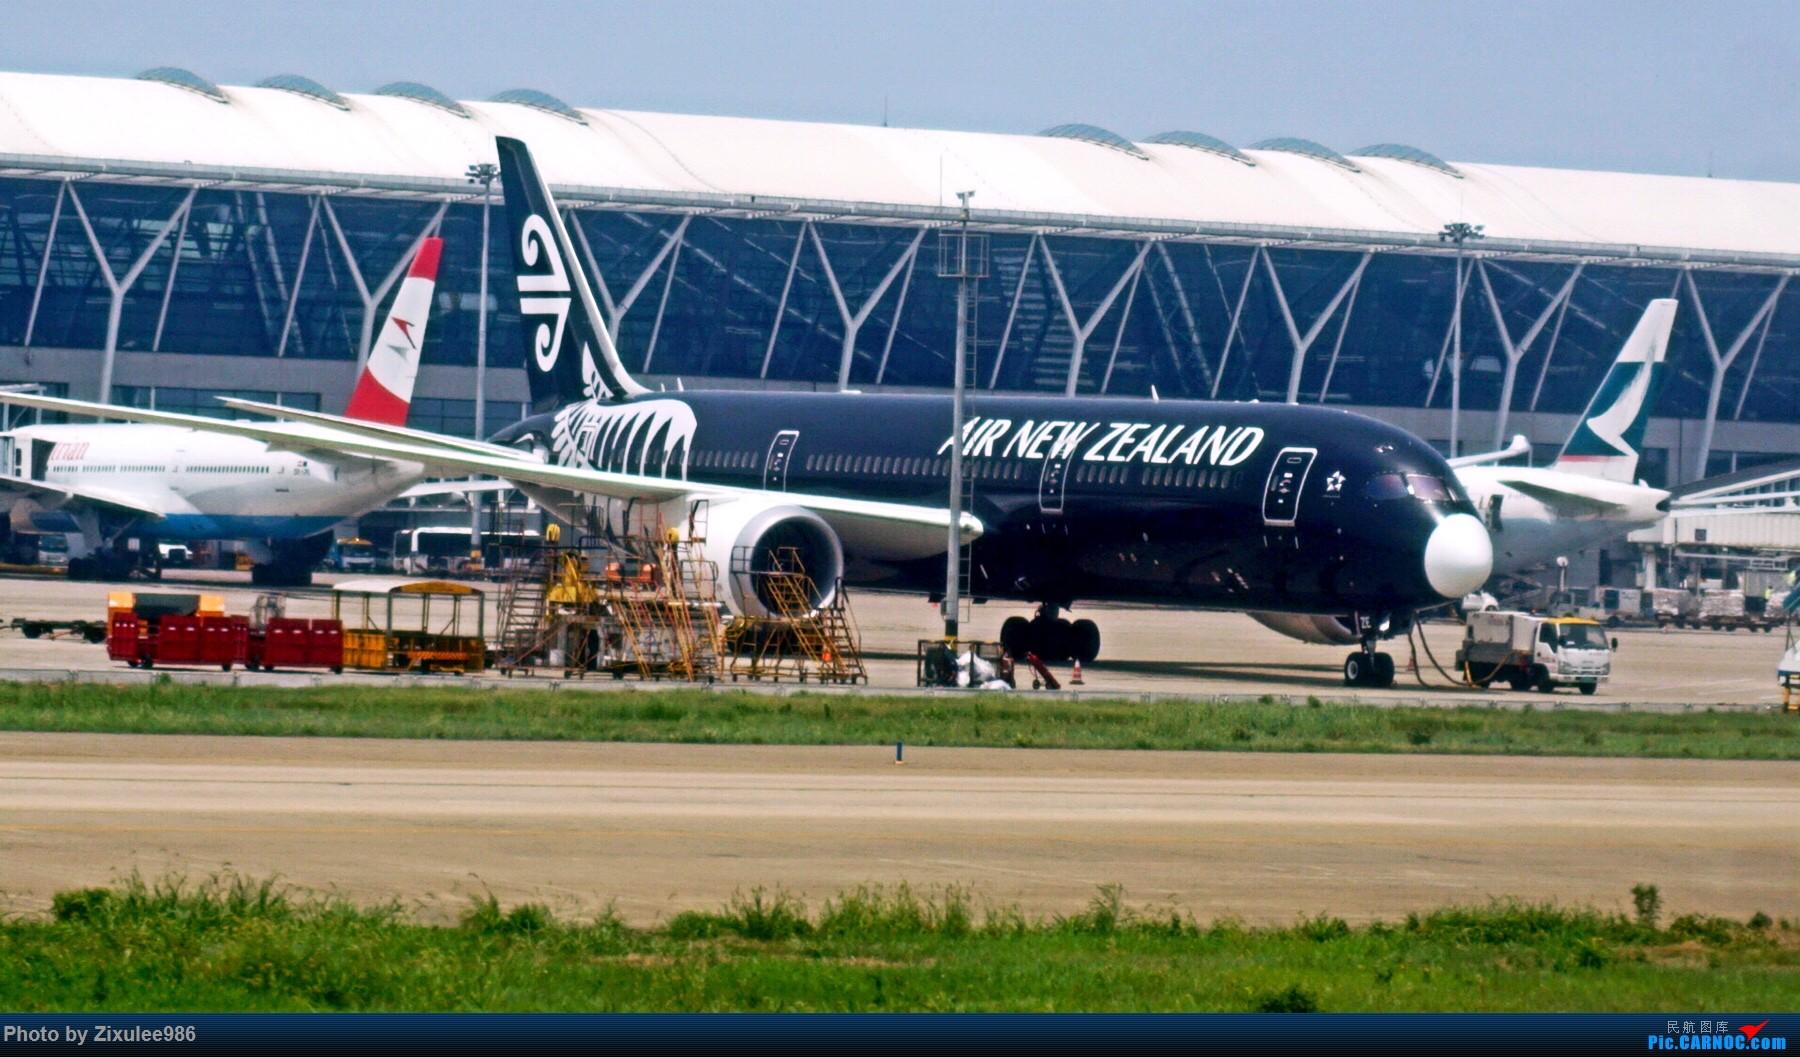 Re:[原创]加拿大21日游学之旅(一)~JJN-PVG-YYZ..(内含flightlog)~第一次发游记~多图缓更请谅解 BOEING 787-9 ZK-NZE 中国上海浦东国际机场